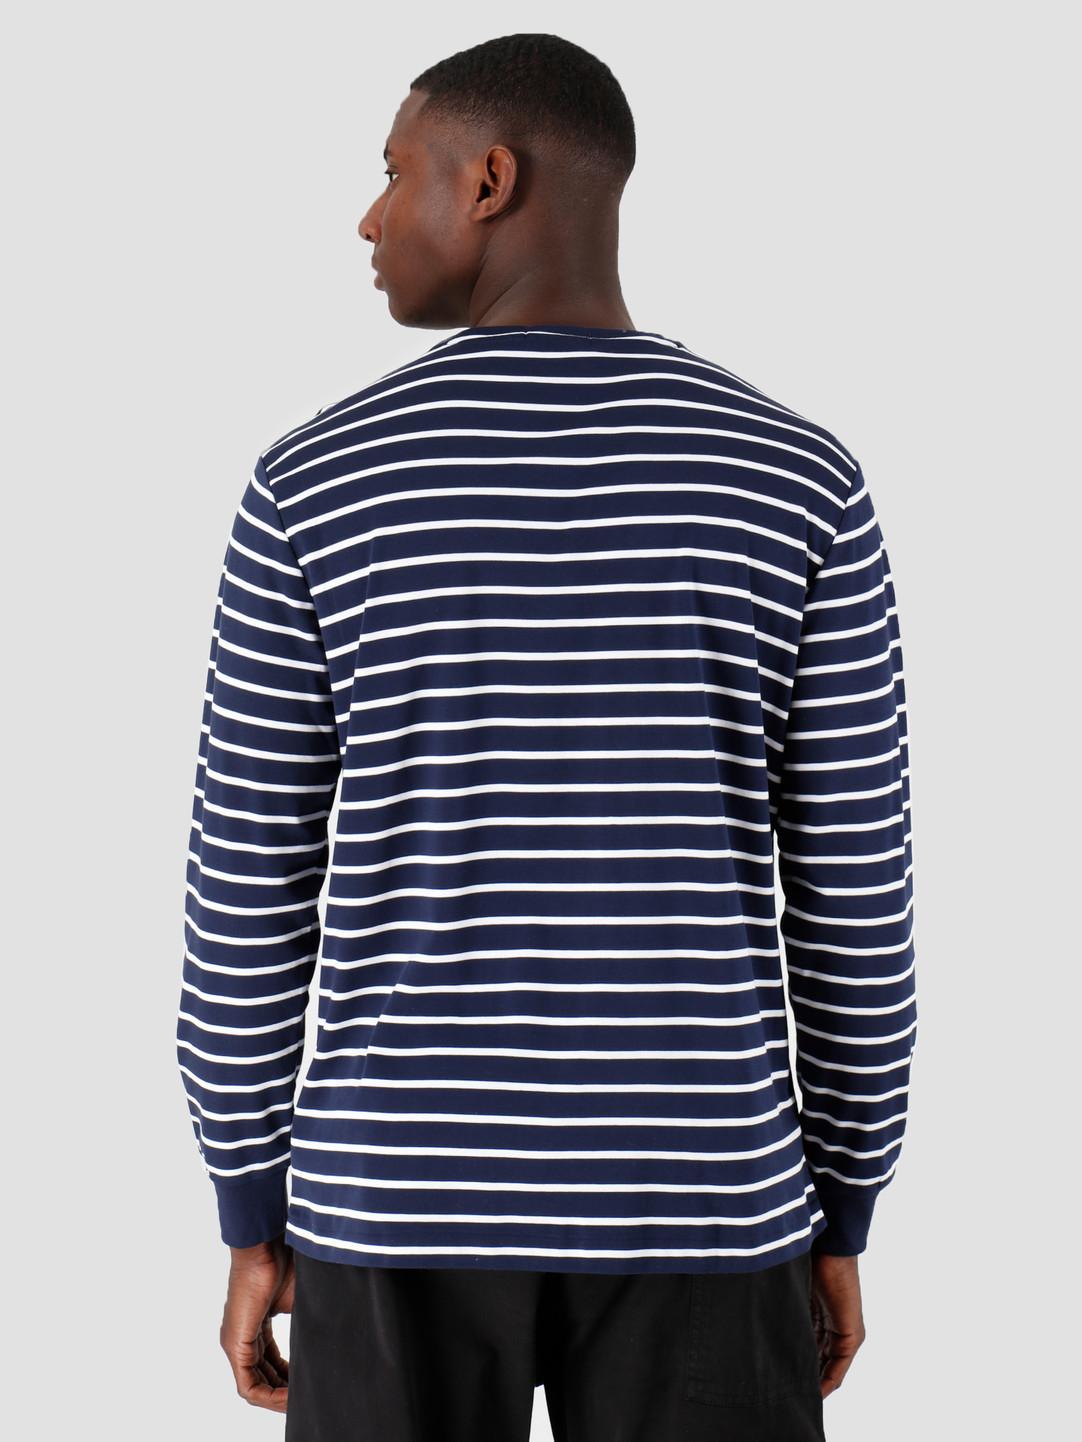 Polo Ralph Lauren Polo Ralph Lauren Lsydcncmslm3 Longsleeve Tshirt Navy 710760122006